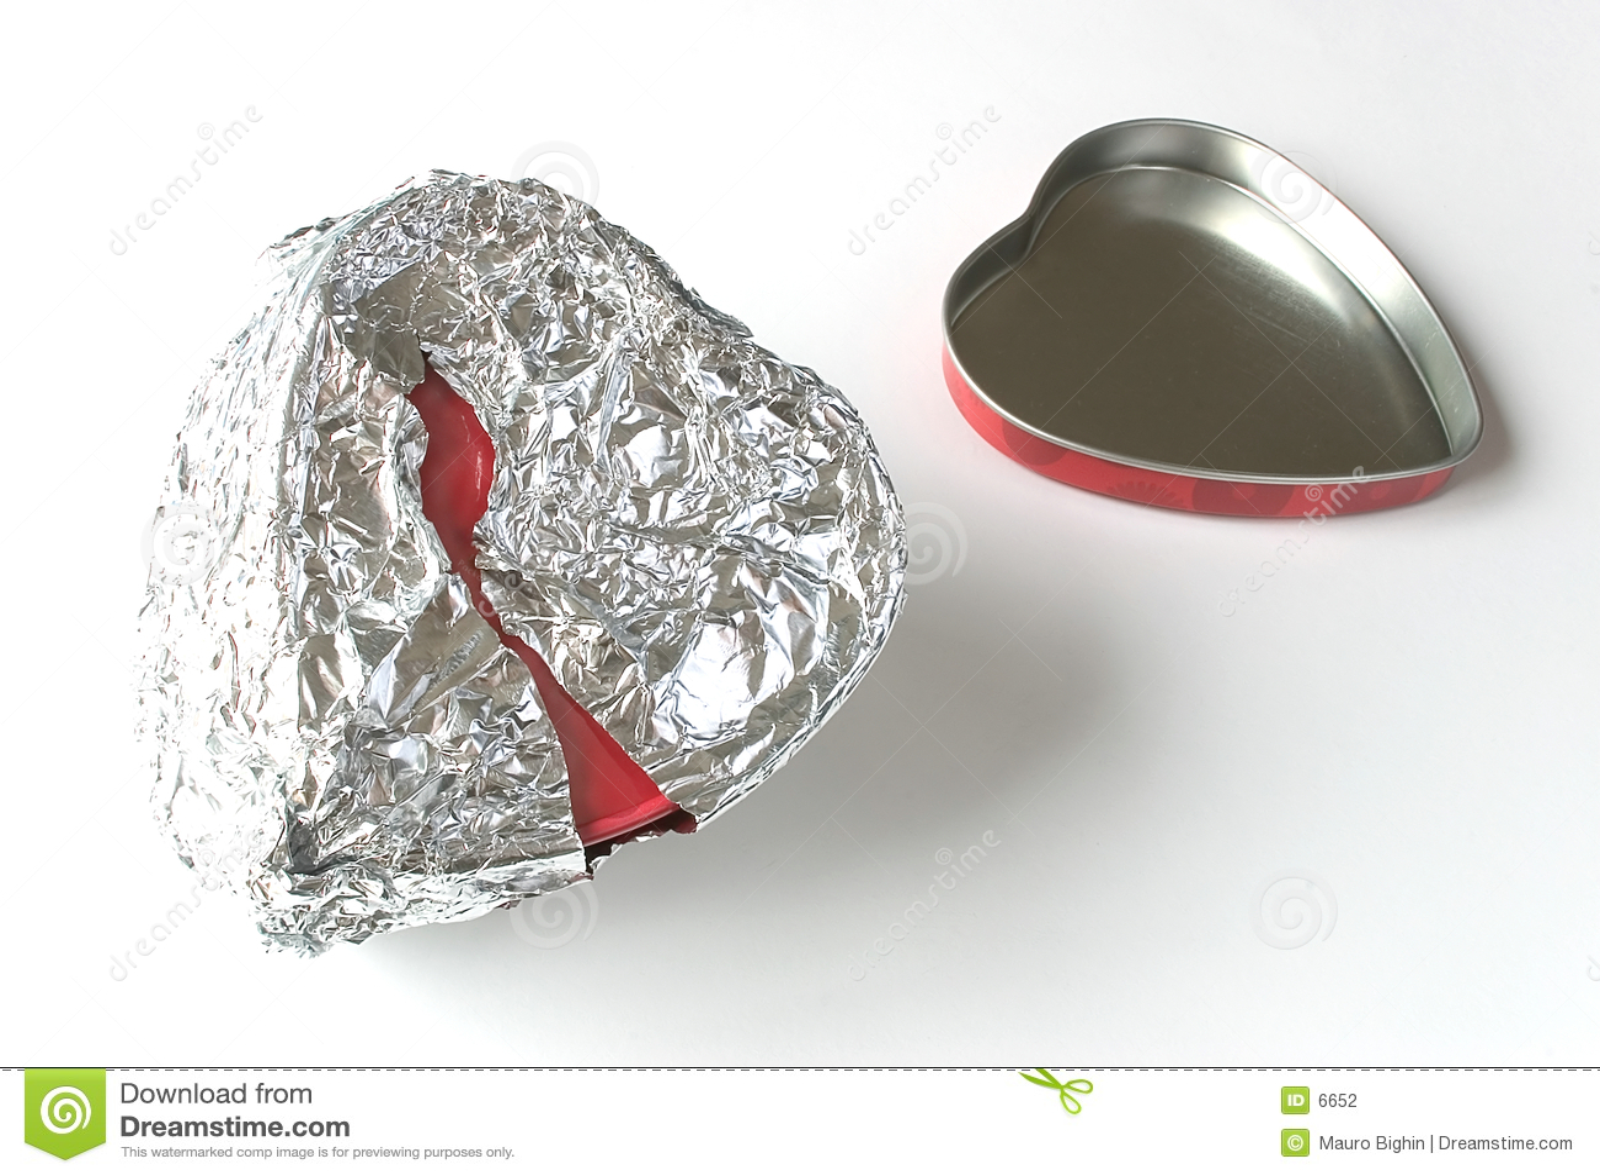 Tin foil heart can